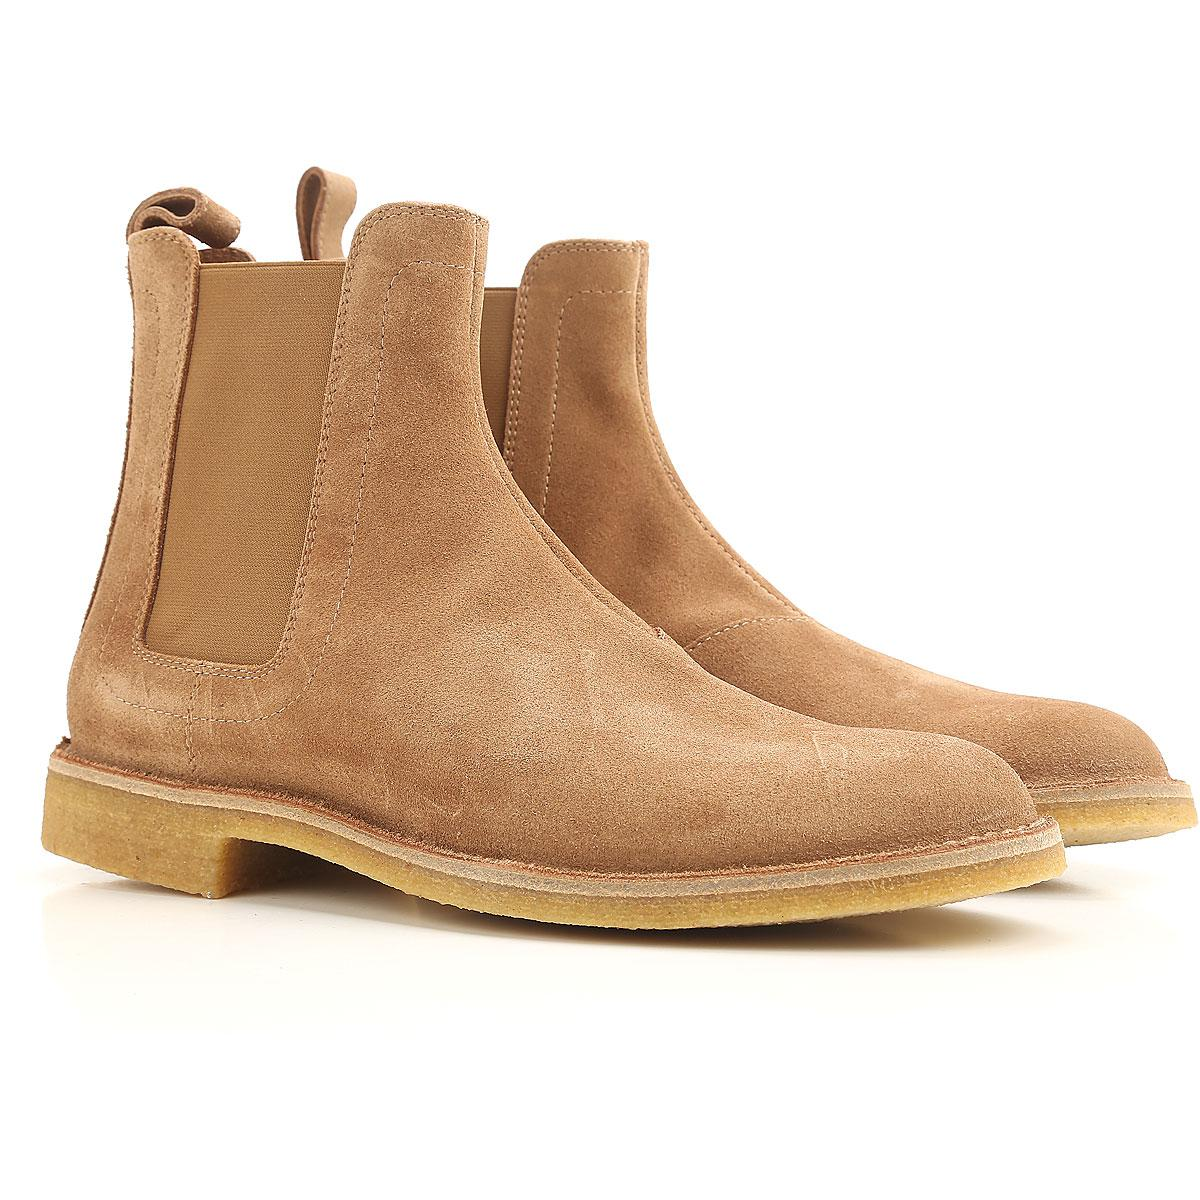 Boots for Men, Booties On Sale, Ardoise, Suede leather, 2017, 9.5 Bottega Veneta